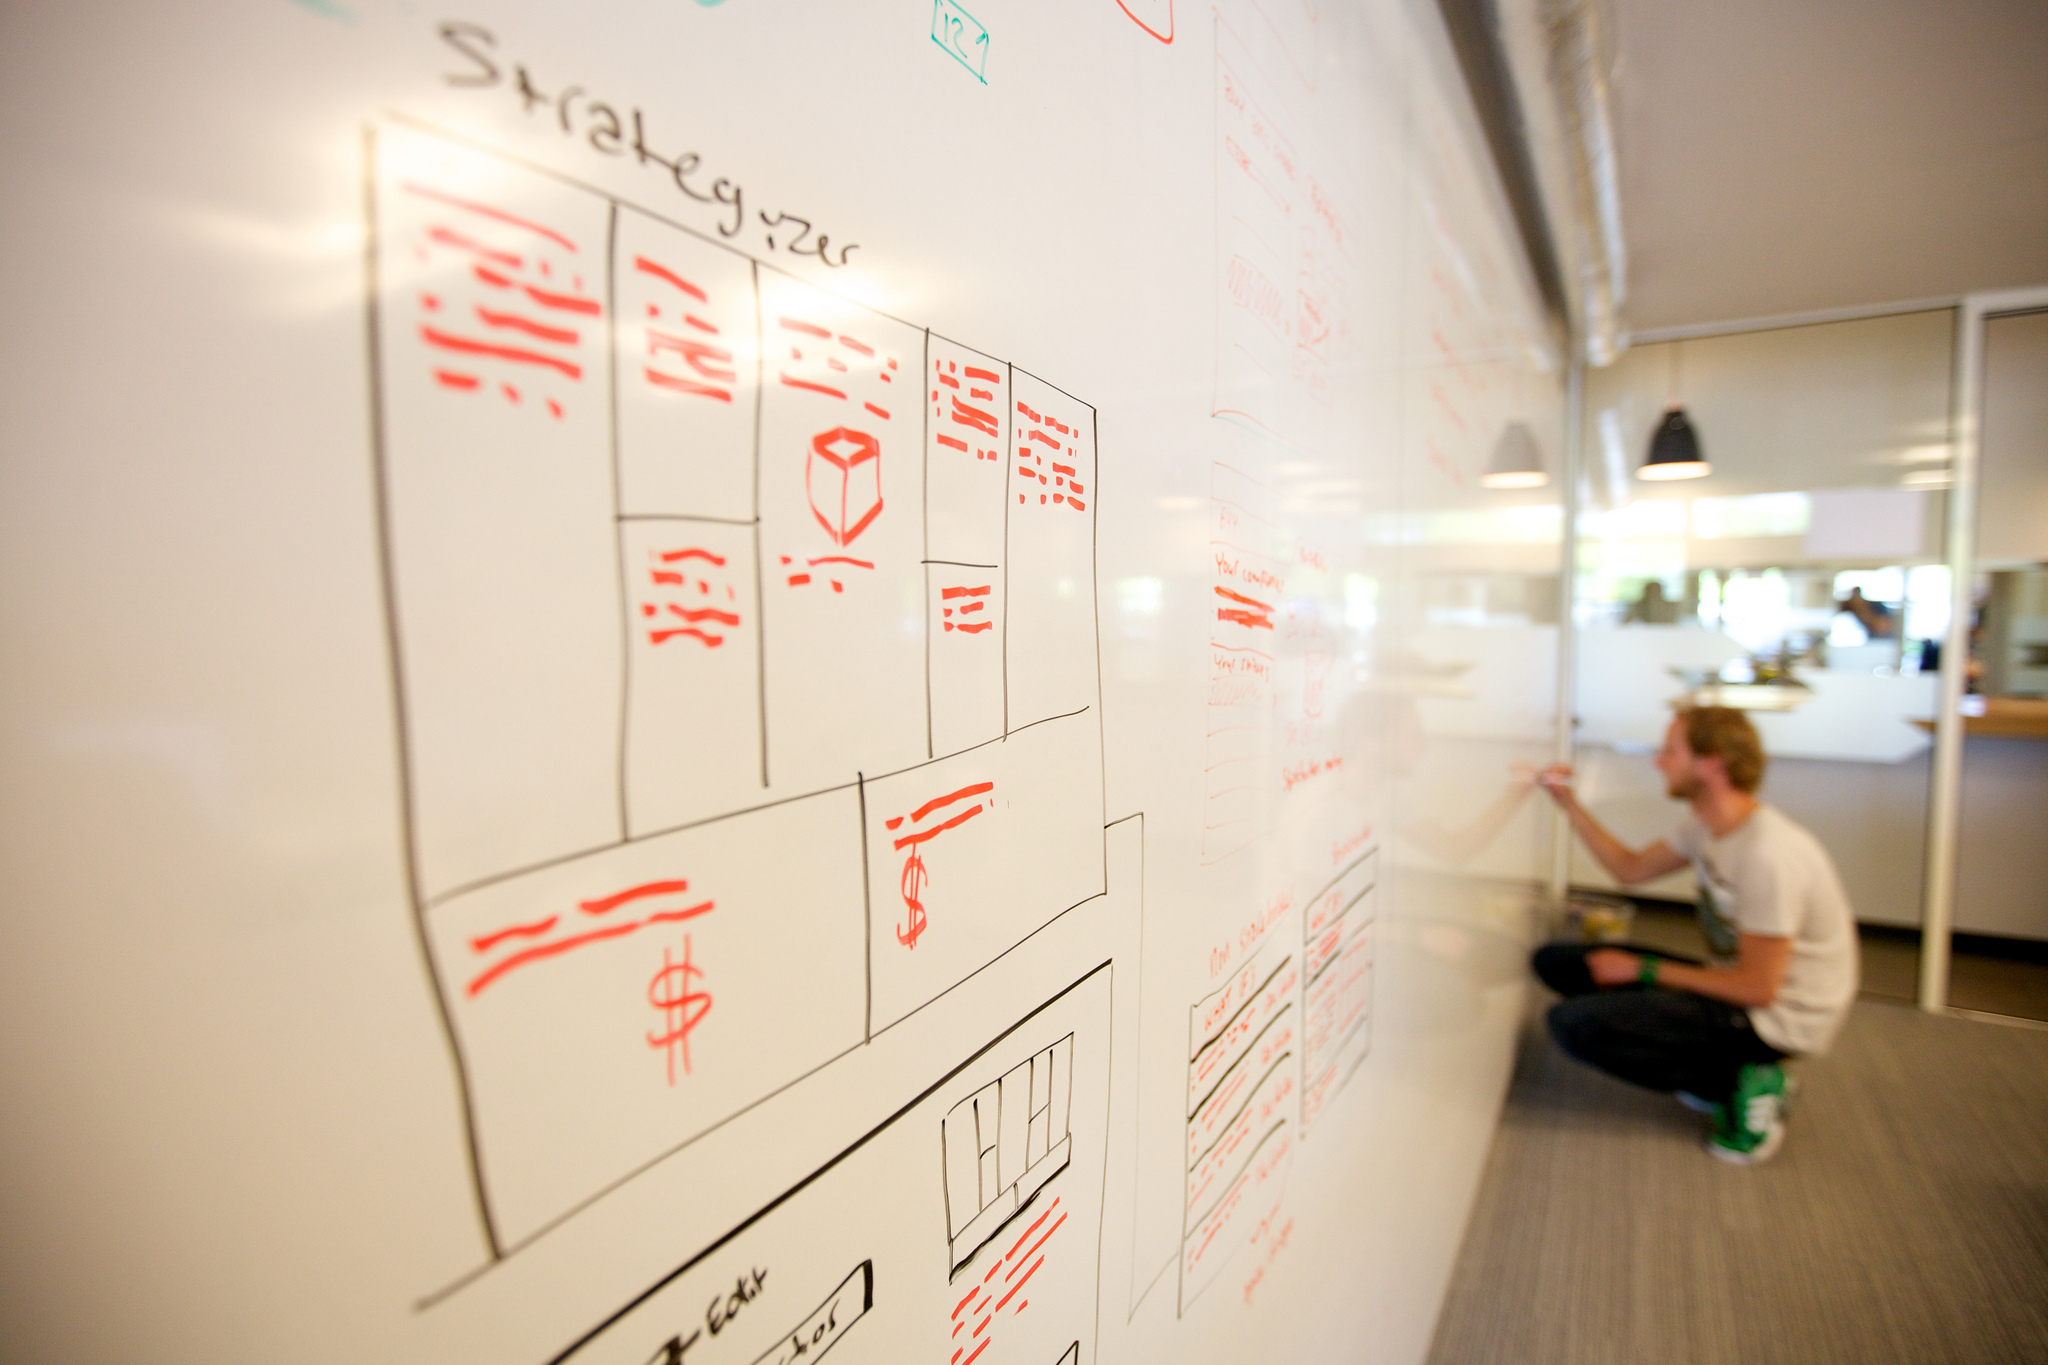 Lean Canvas - Strategyzer